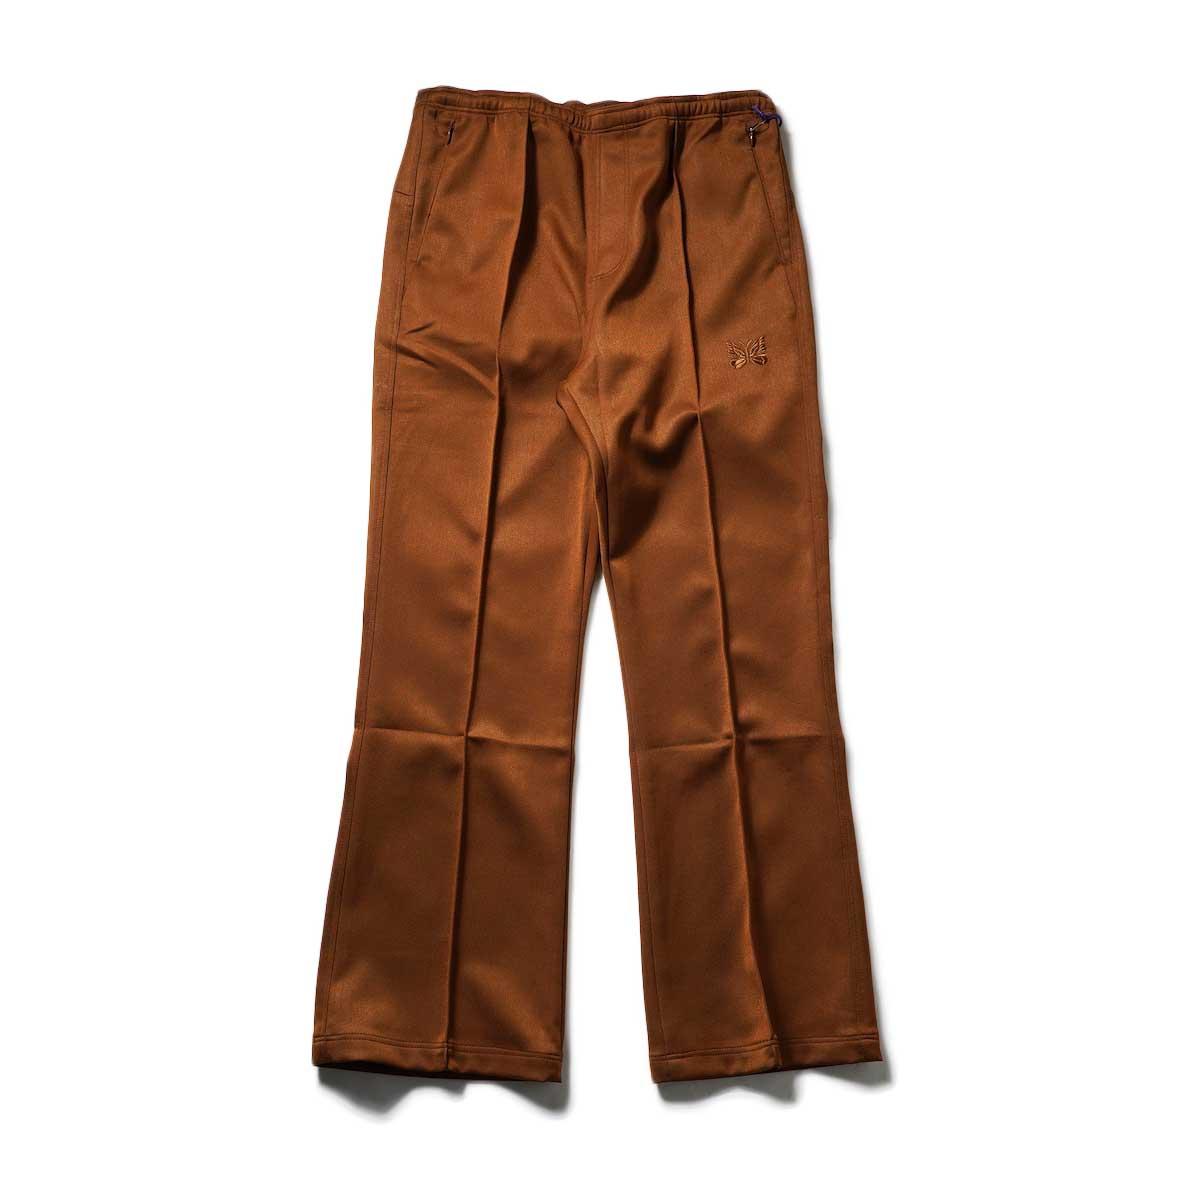 Needles / W.U. BOOT-CUT PANT - PE/R DOESKIN (Brown)